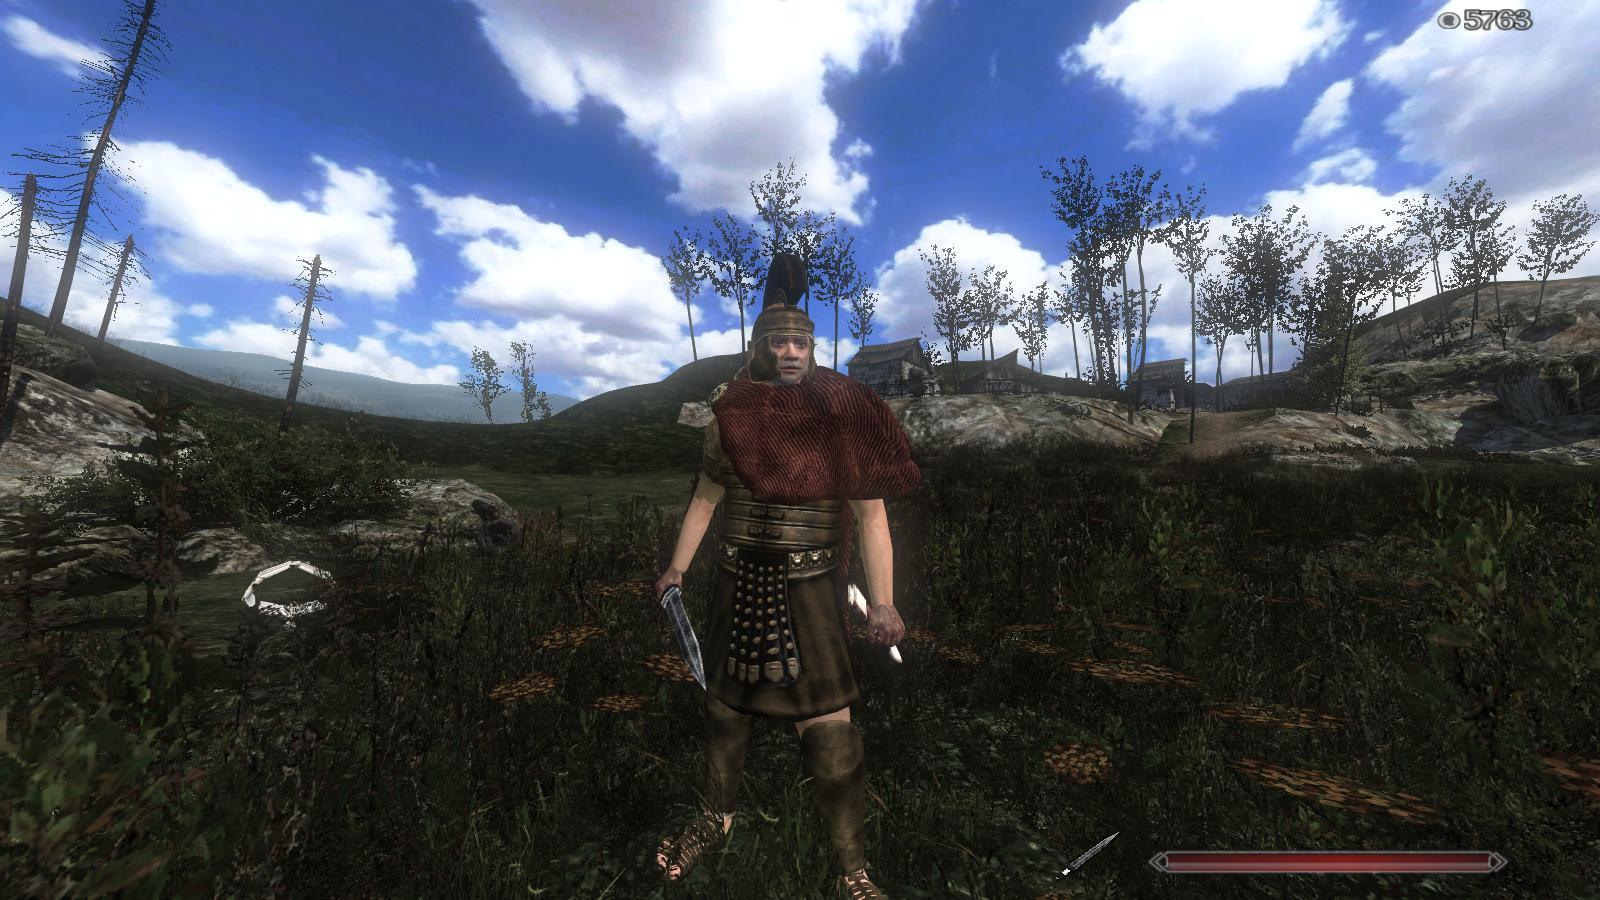 [SP] Full invasion 2 - Single Player PkYpkti